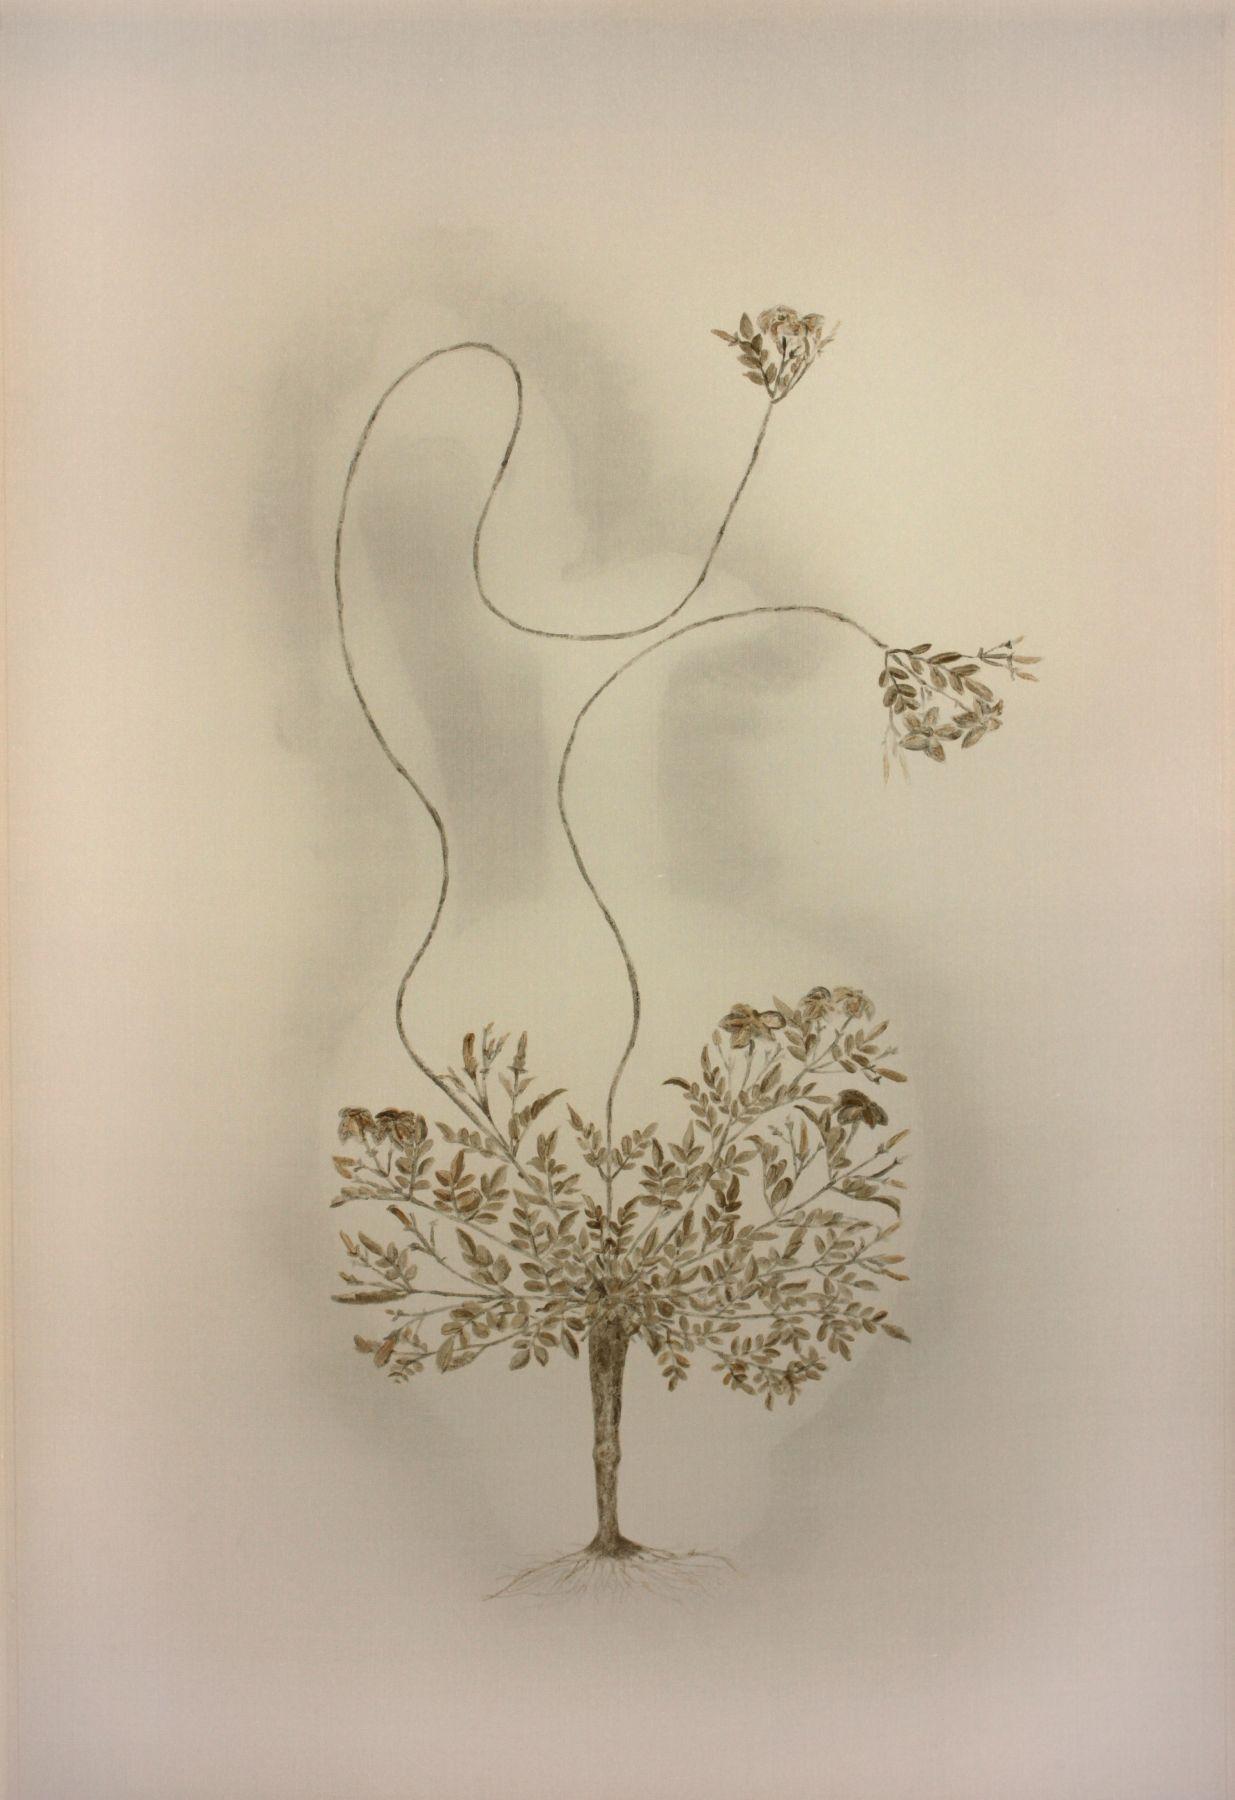 Vase of Flowers 瓶花, 2011